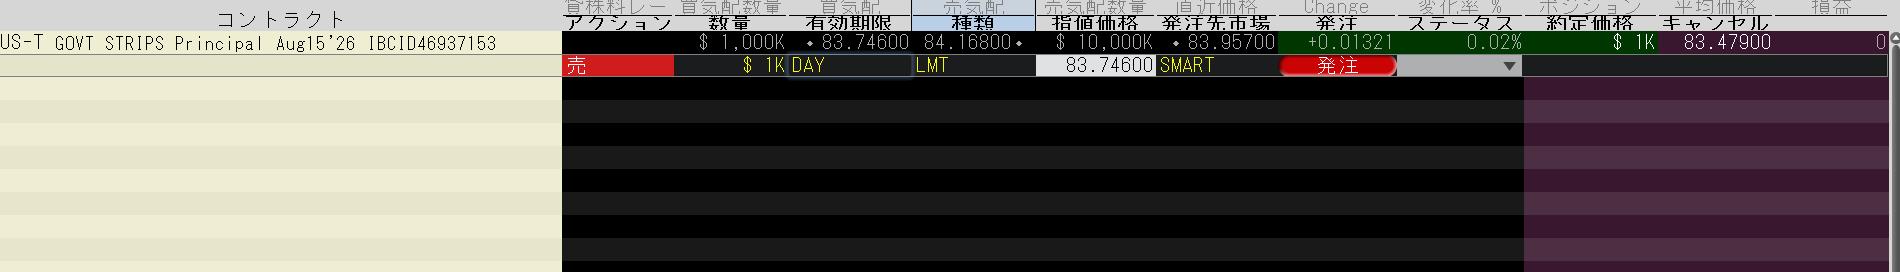 2016-06-10_100306